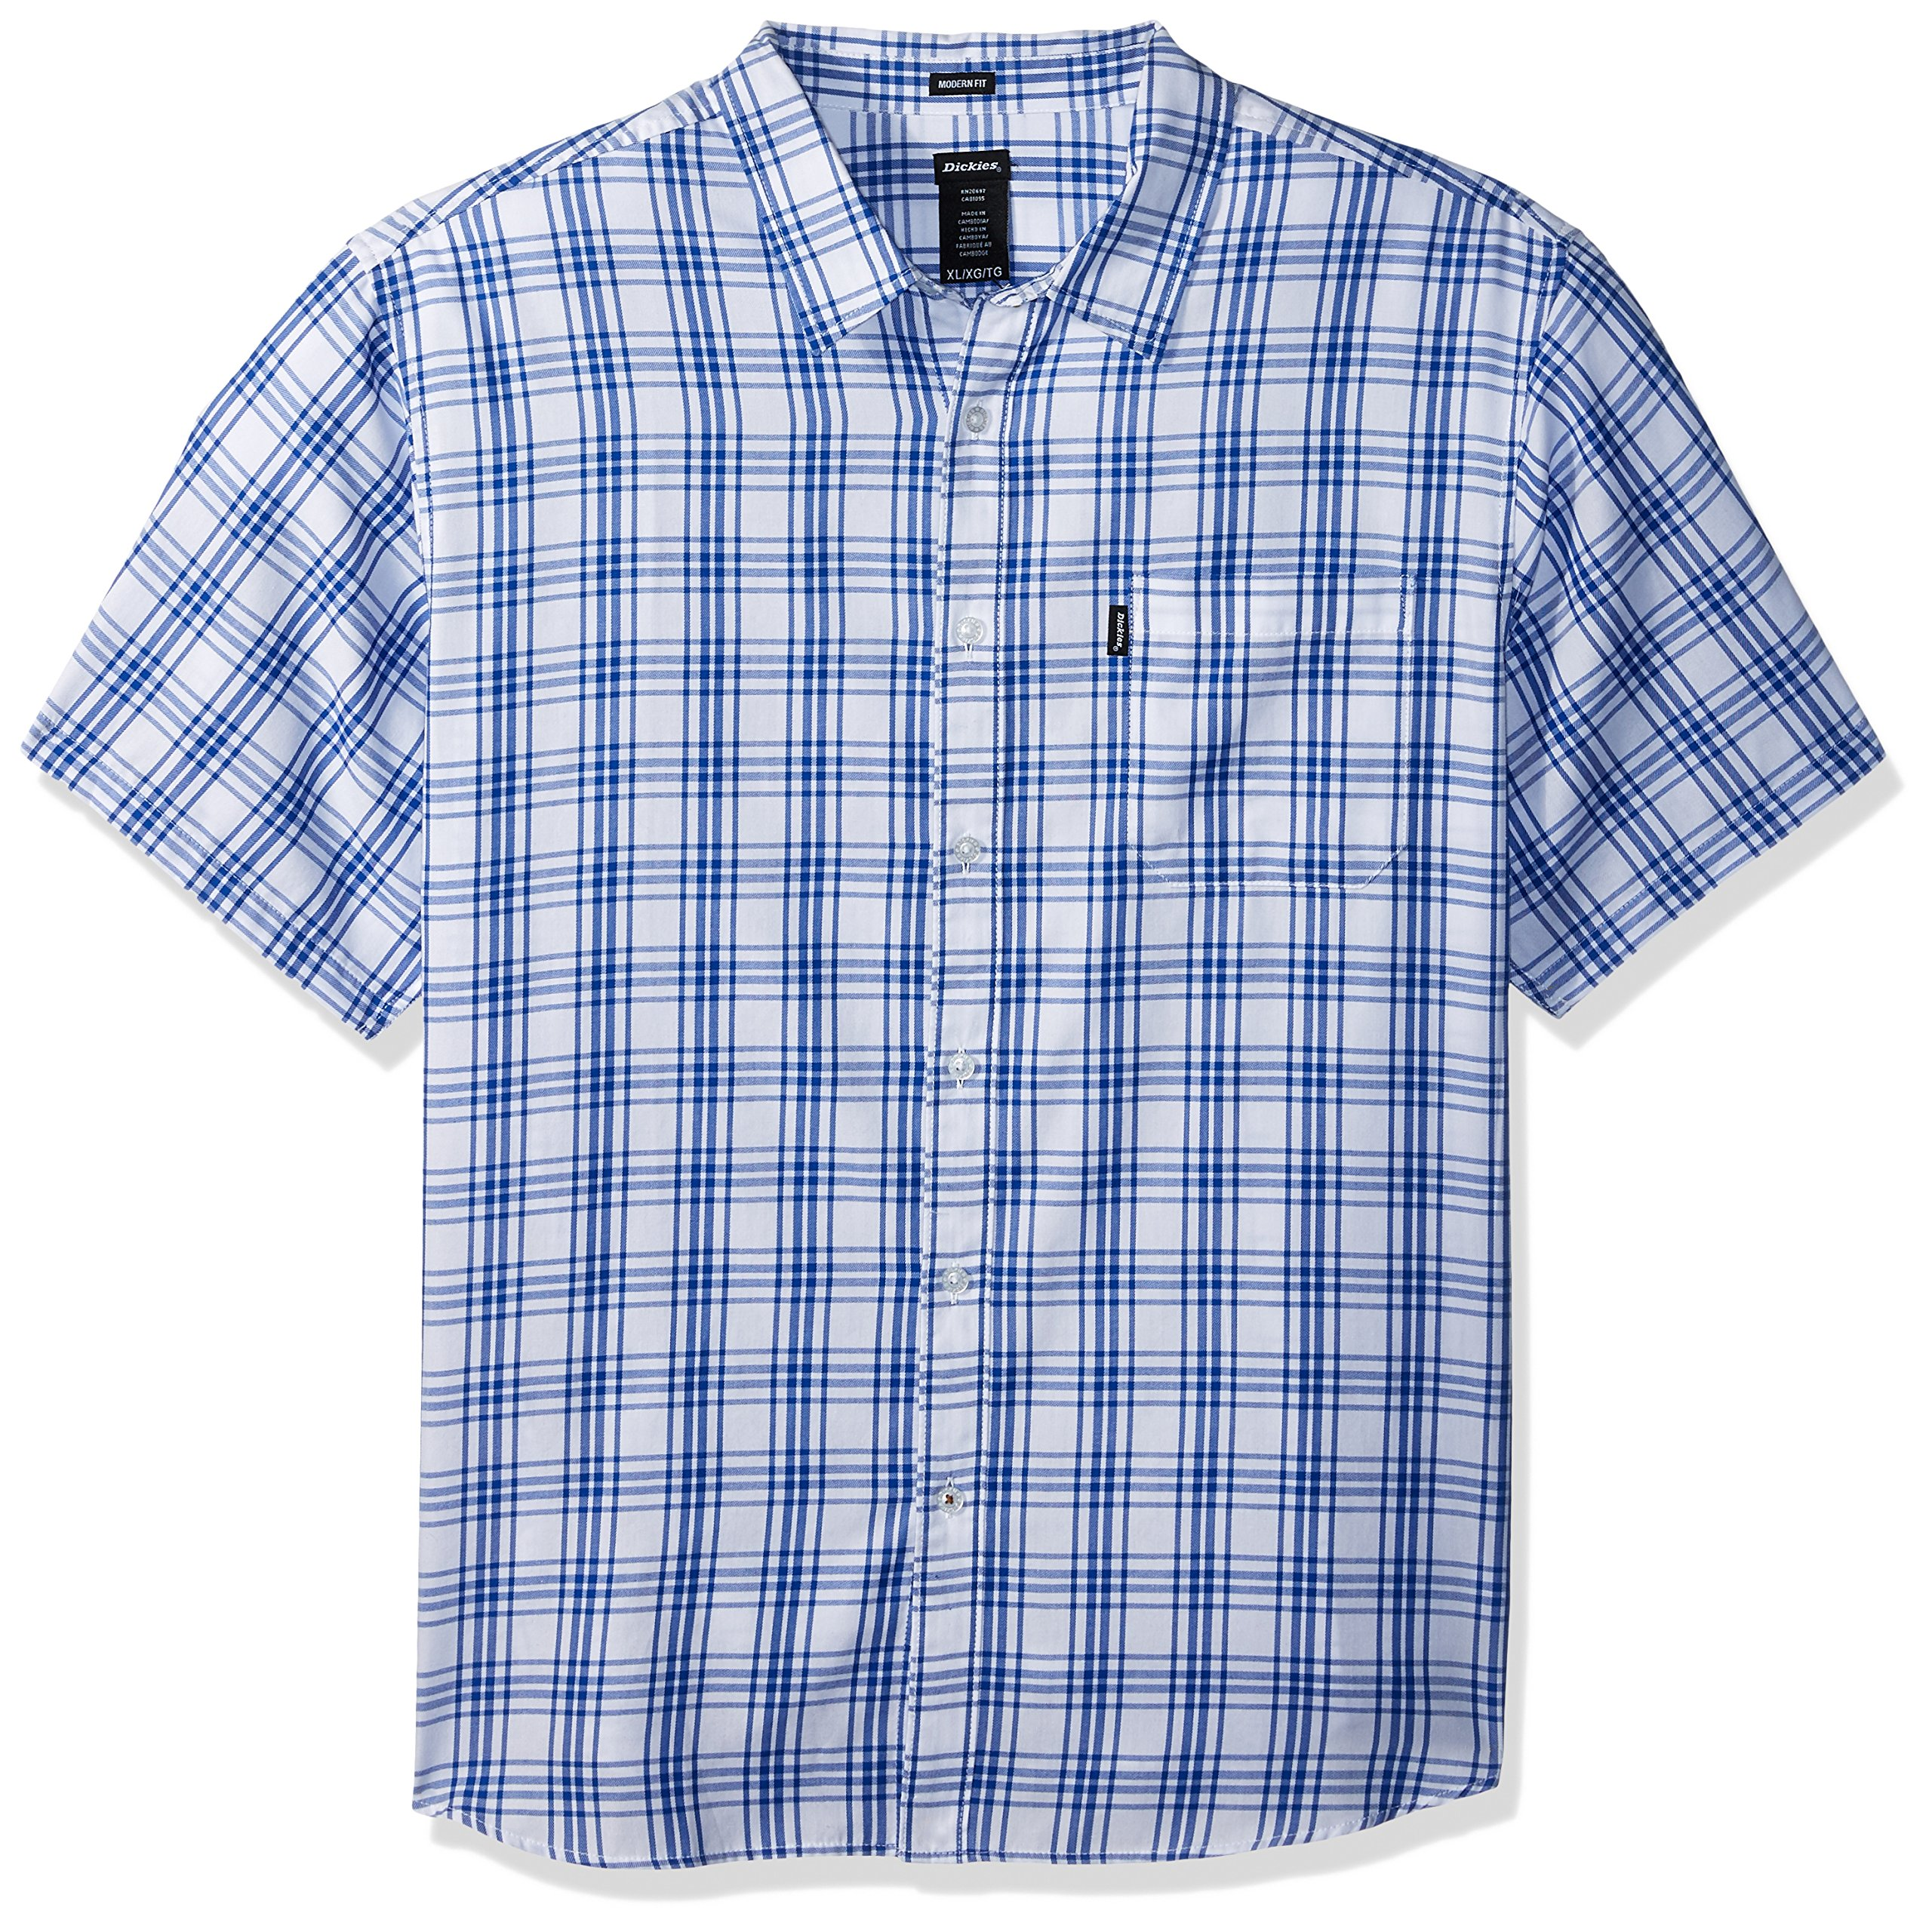 Dickies Men's Modern Fit Yarn Dyed Plaid Short Sleeve Shirt, White/Blue Plaid, XL